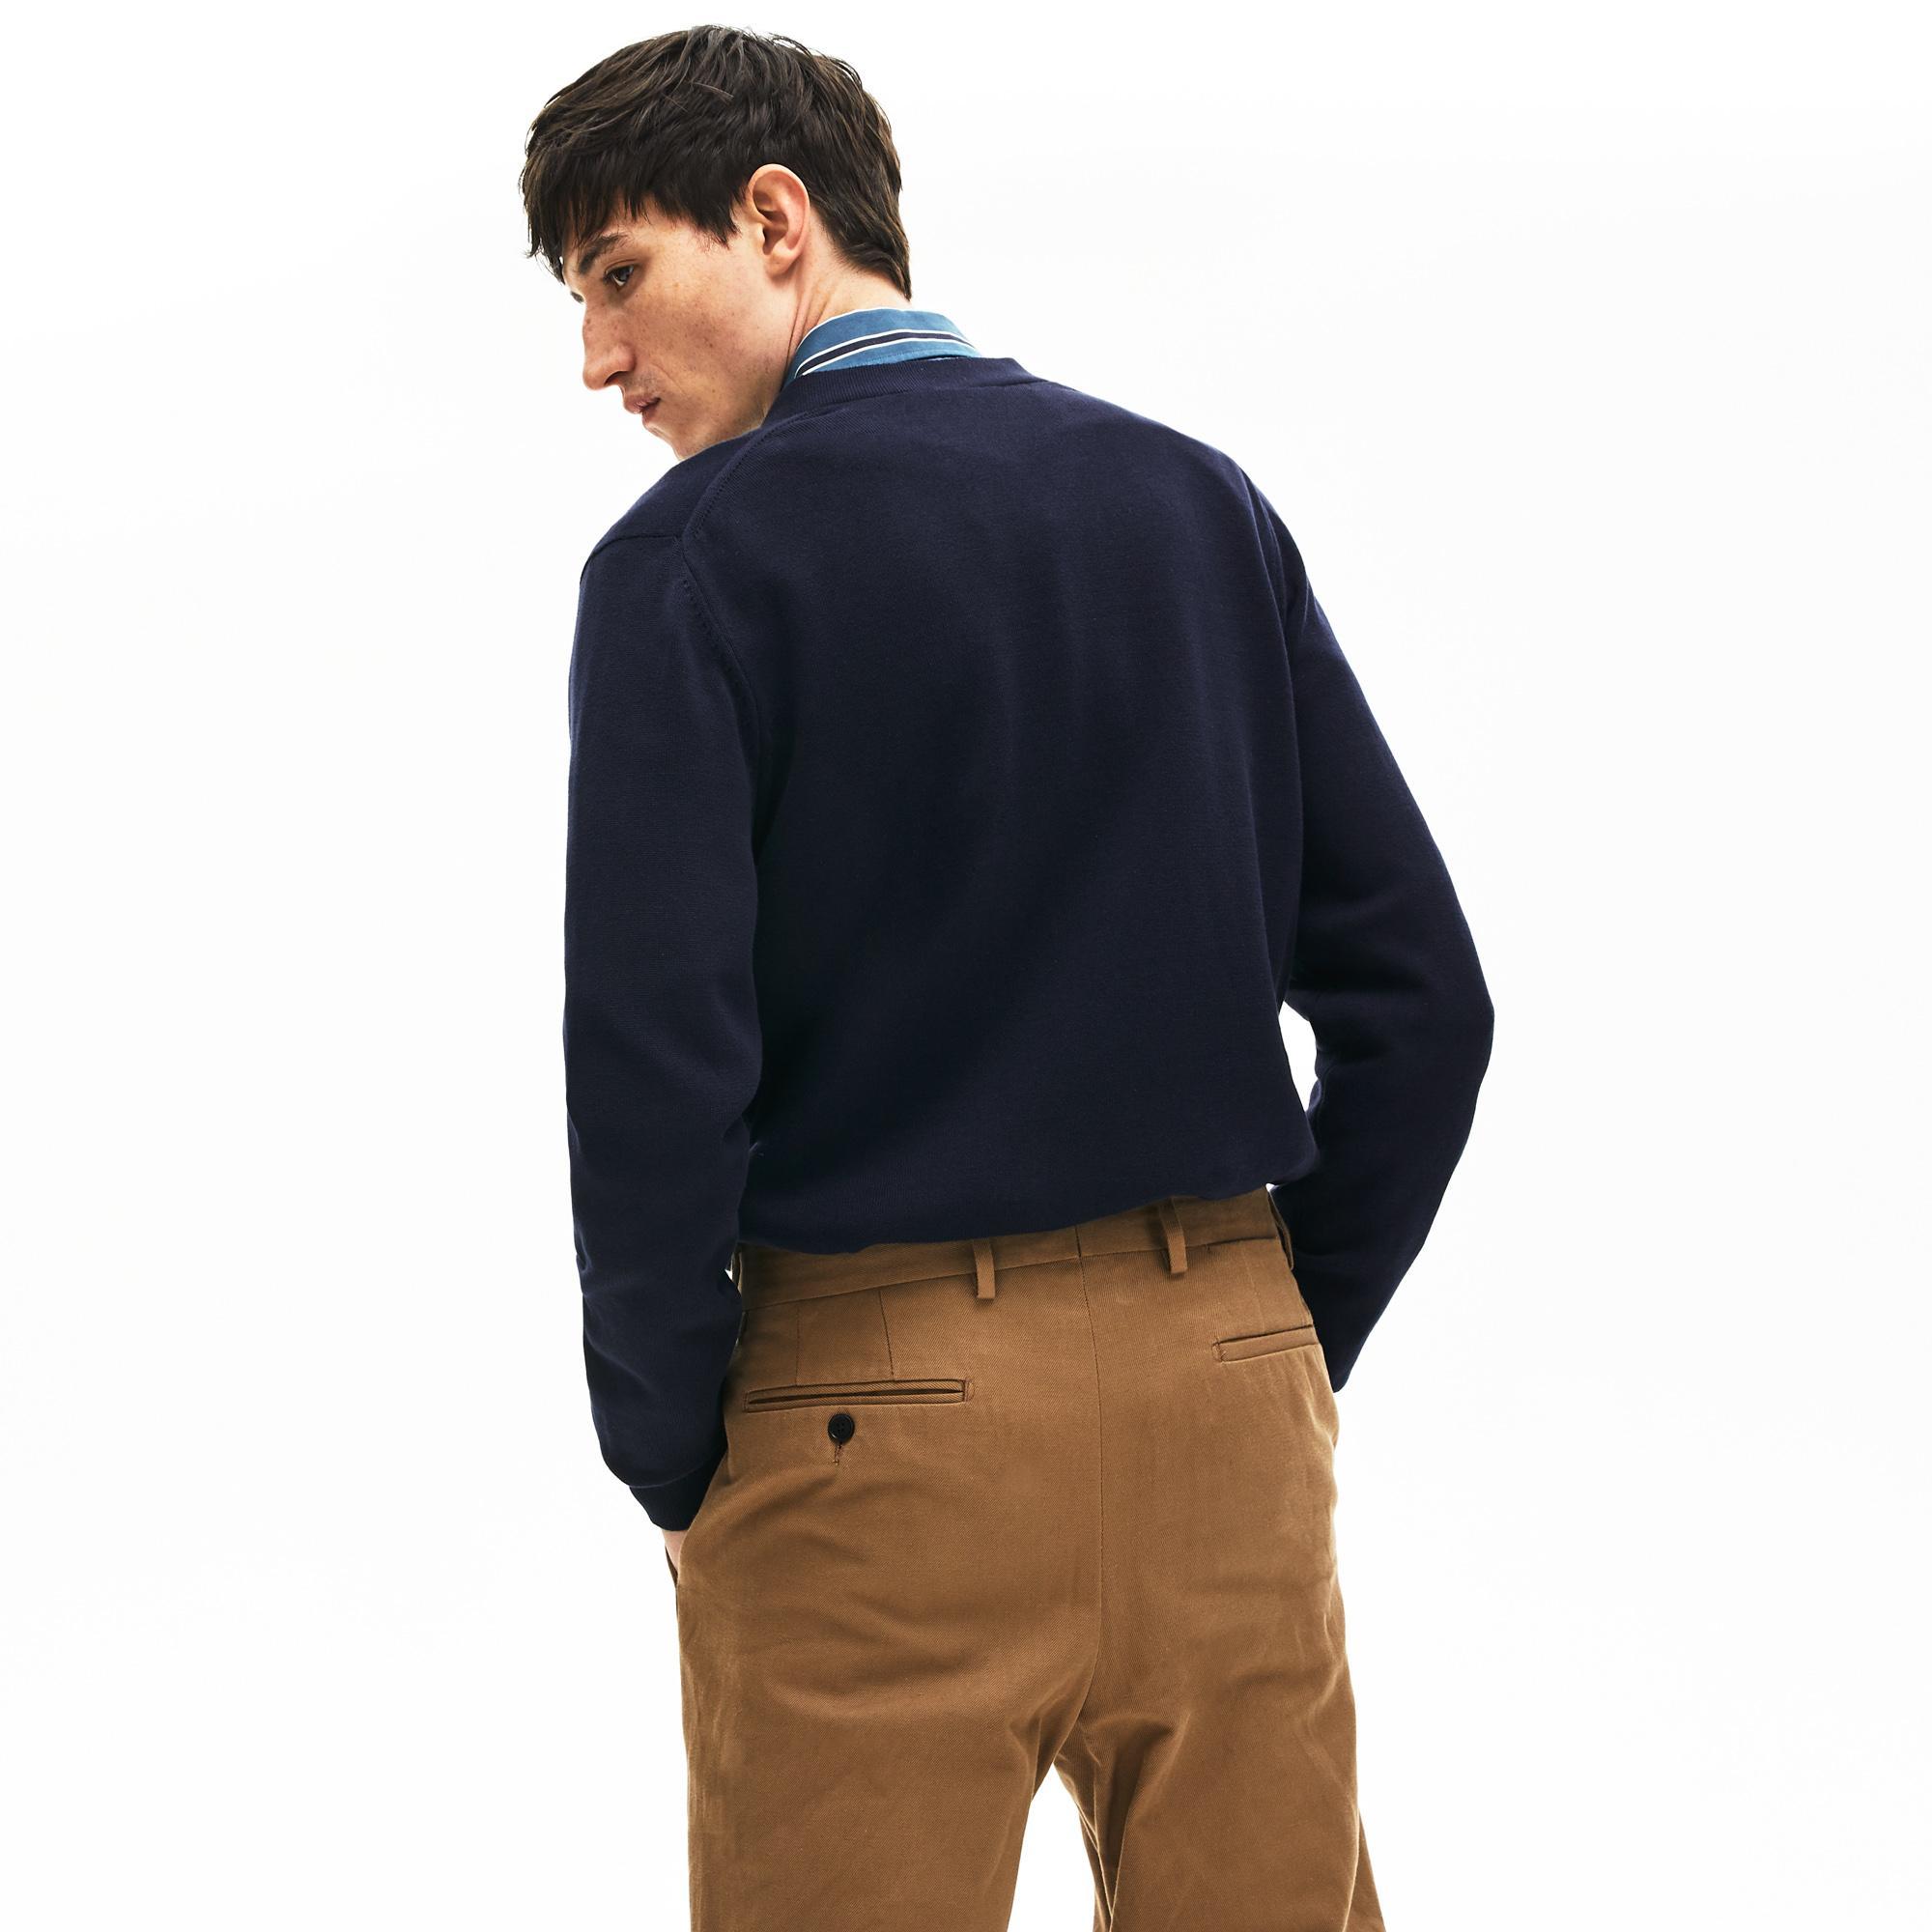 Lacoste Men's Pockets Buttoned Cotton Cardigan